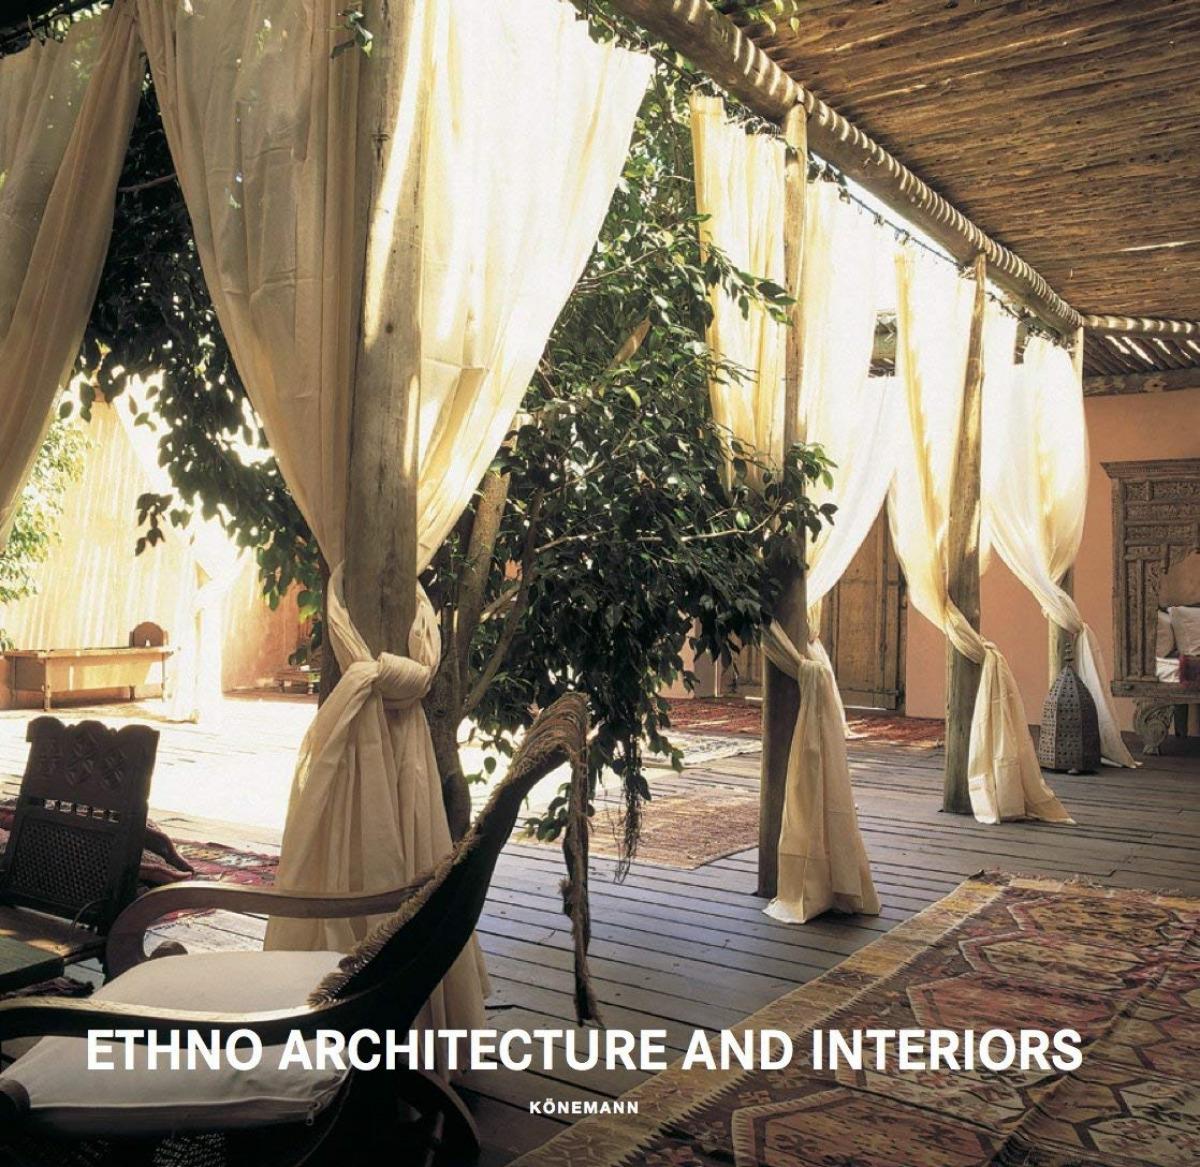 ETHNO ARCHITECTURE &INTERIORS 9783741920448